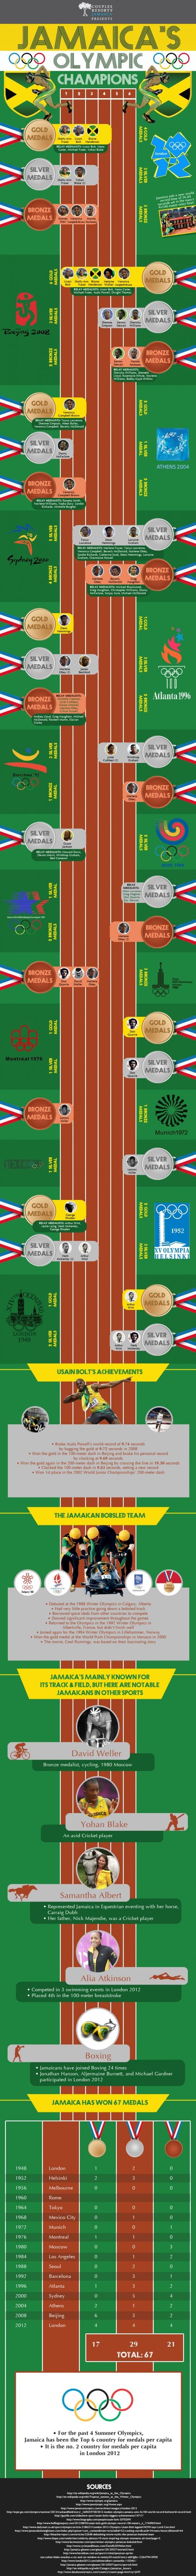 Jamaica's Olympic Champions Infographic